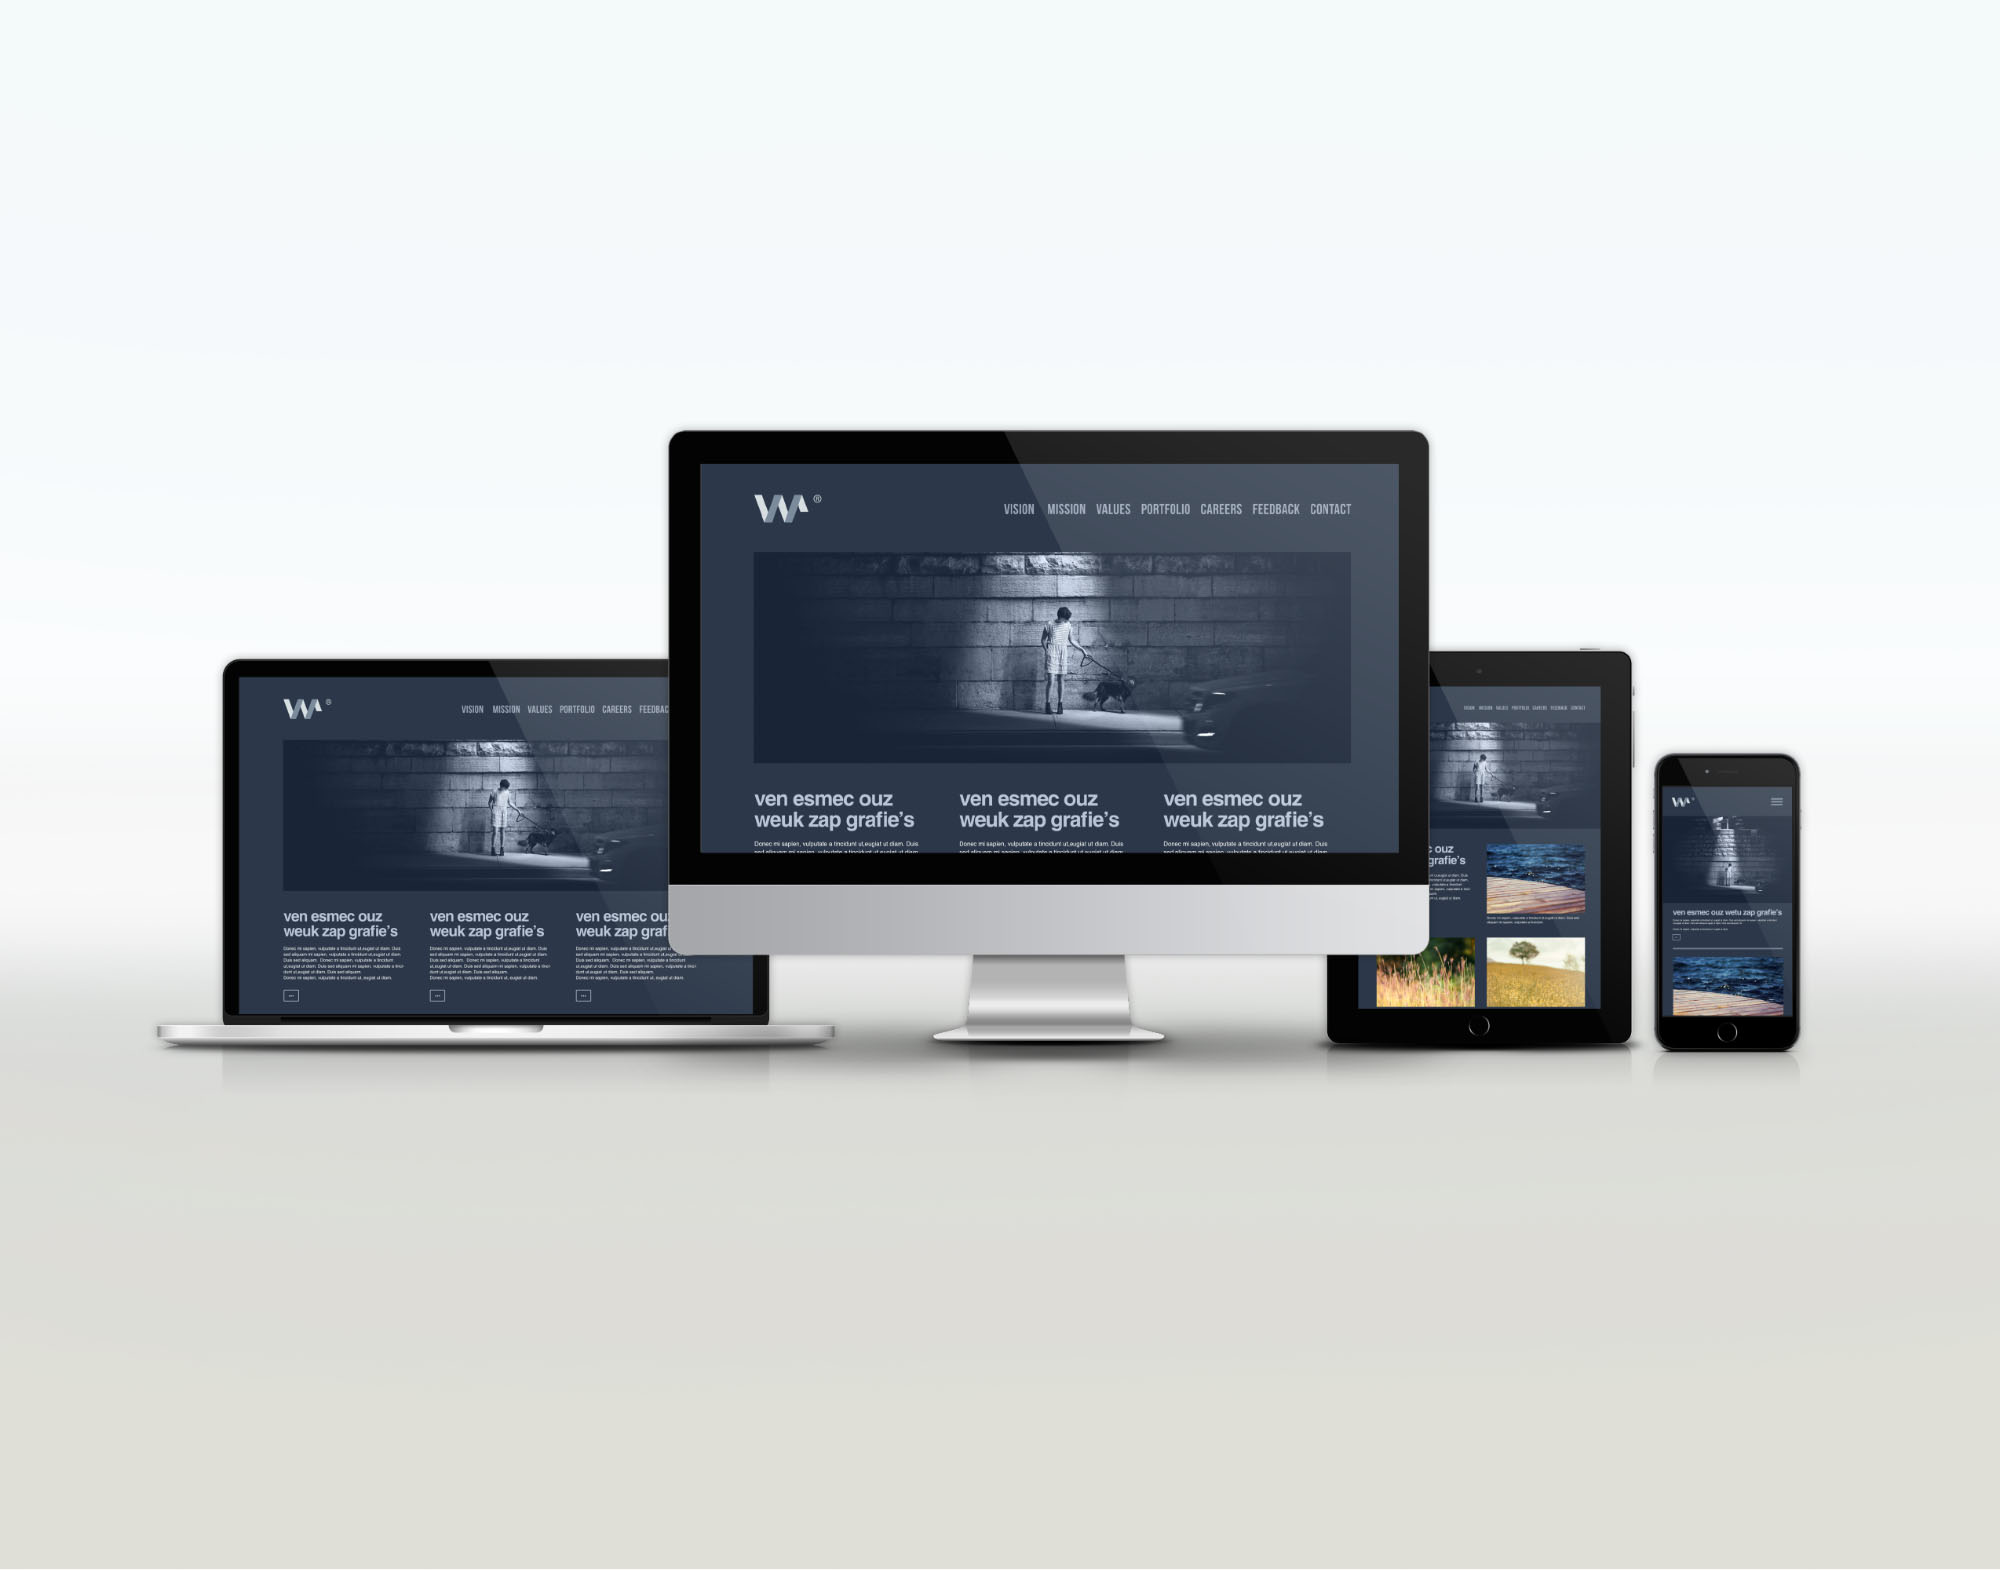 design your website using elementor pro page builder